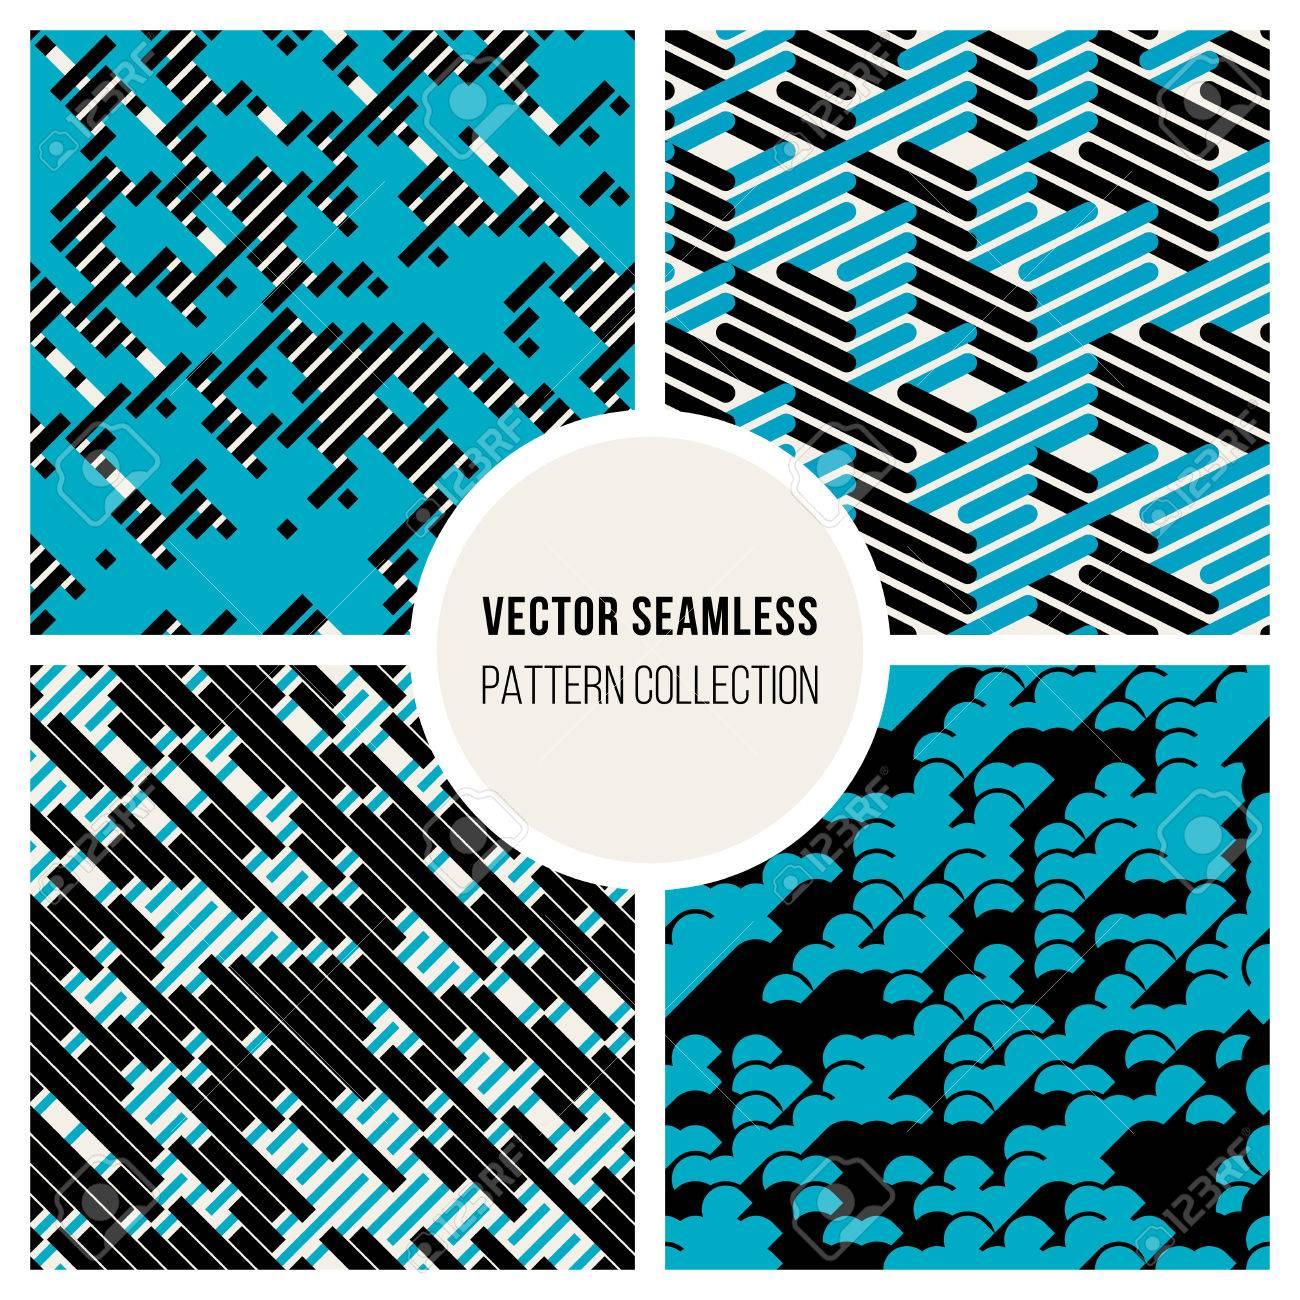 Vector Seamless Black White Blue Random Diagonal Parallel Lines Experimental Pattern Background - 51984908